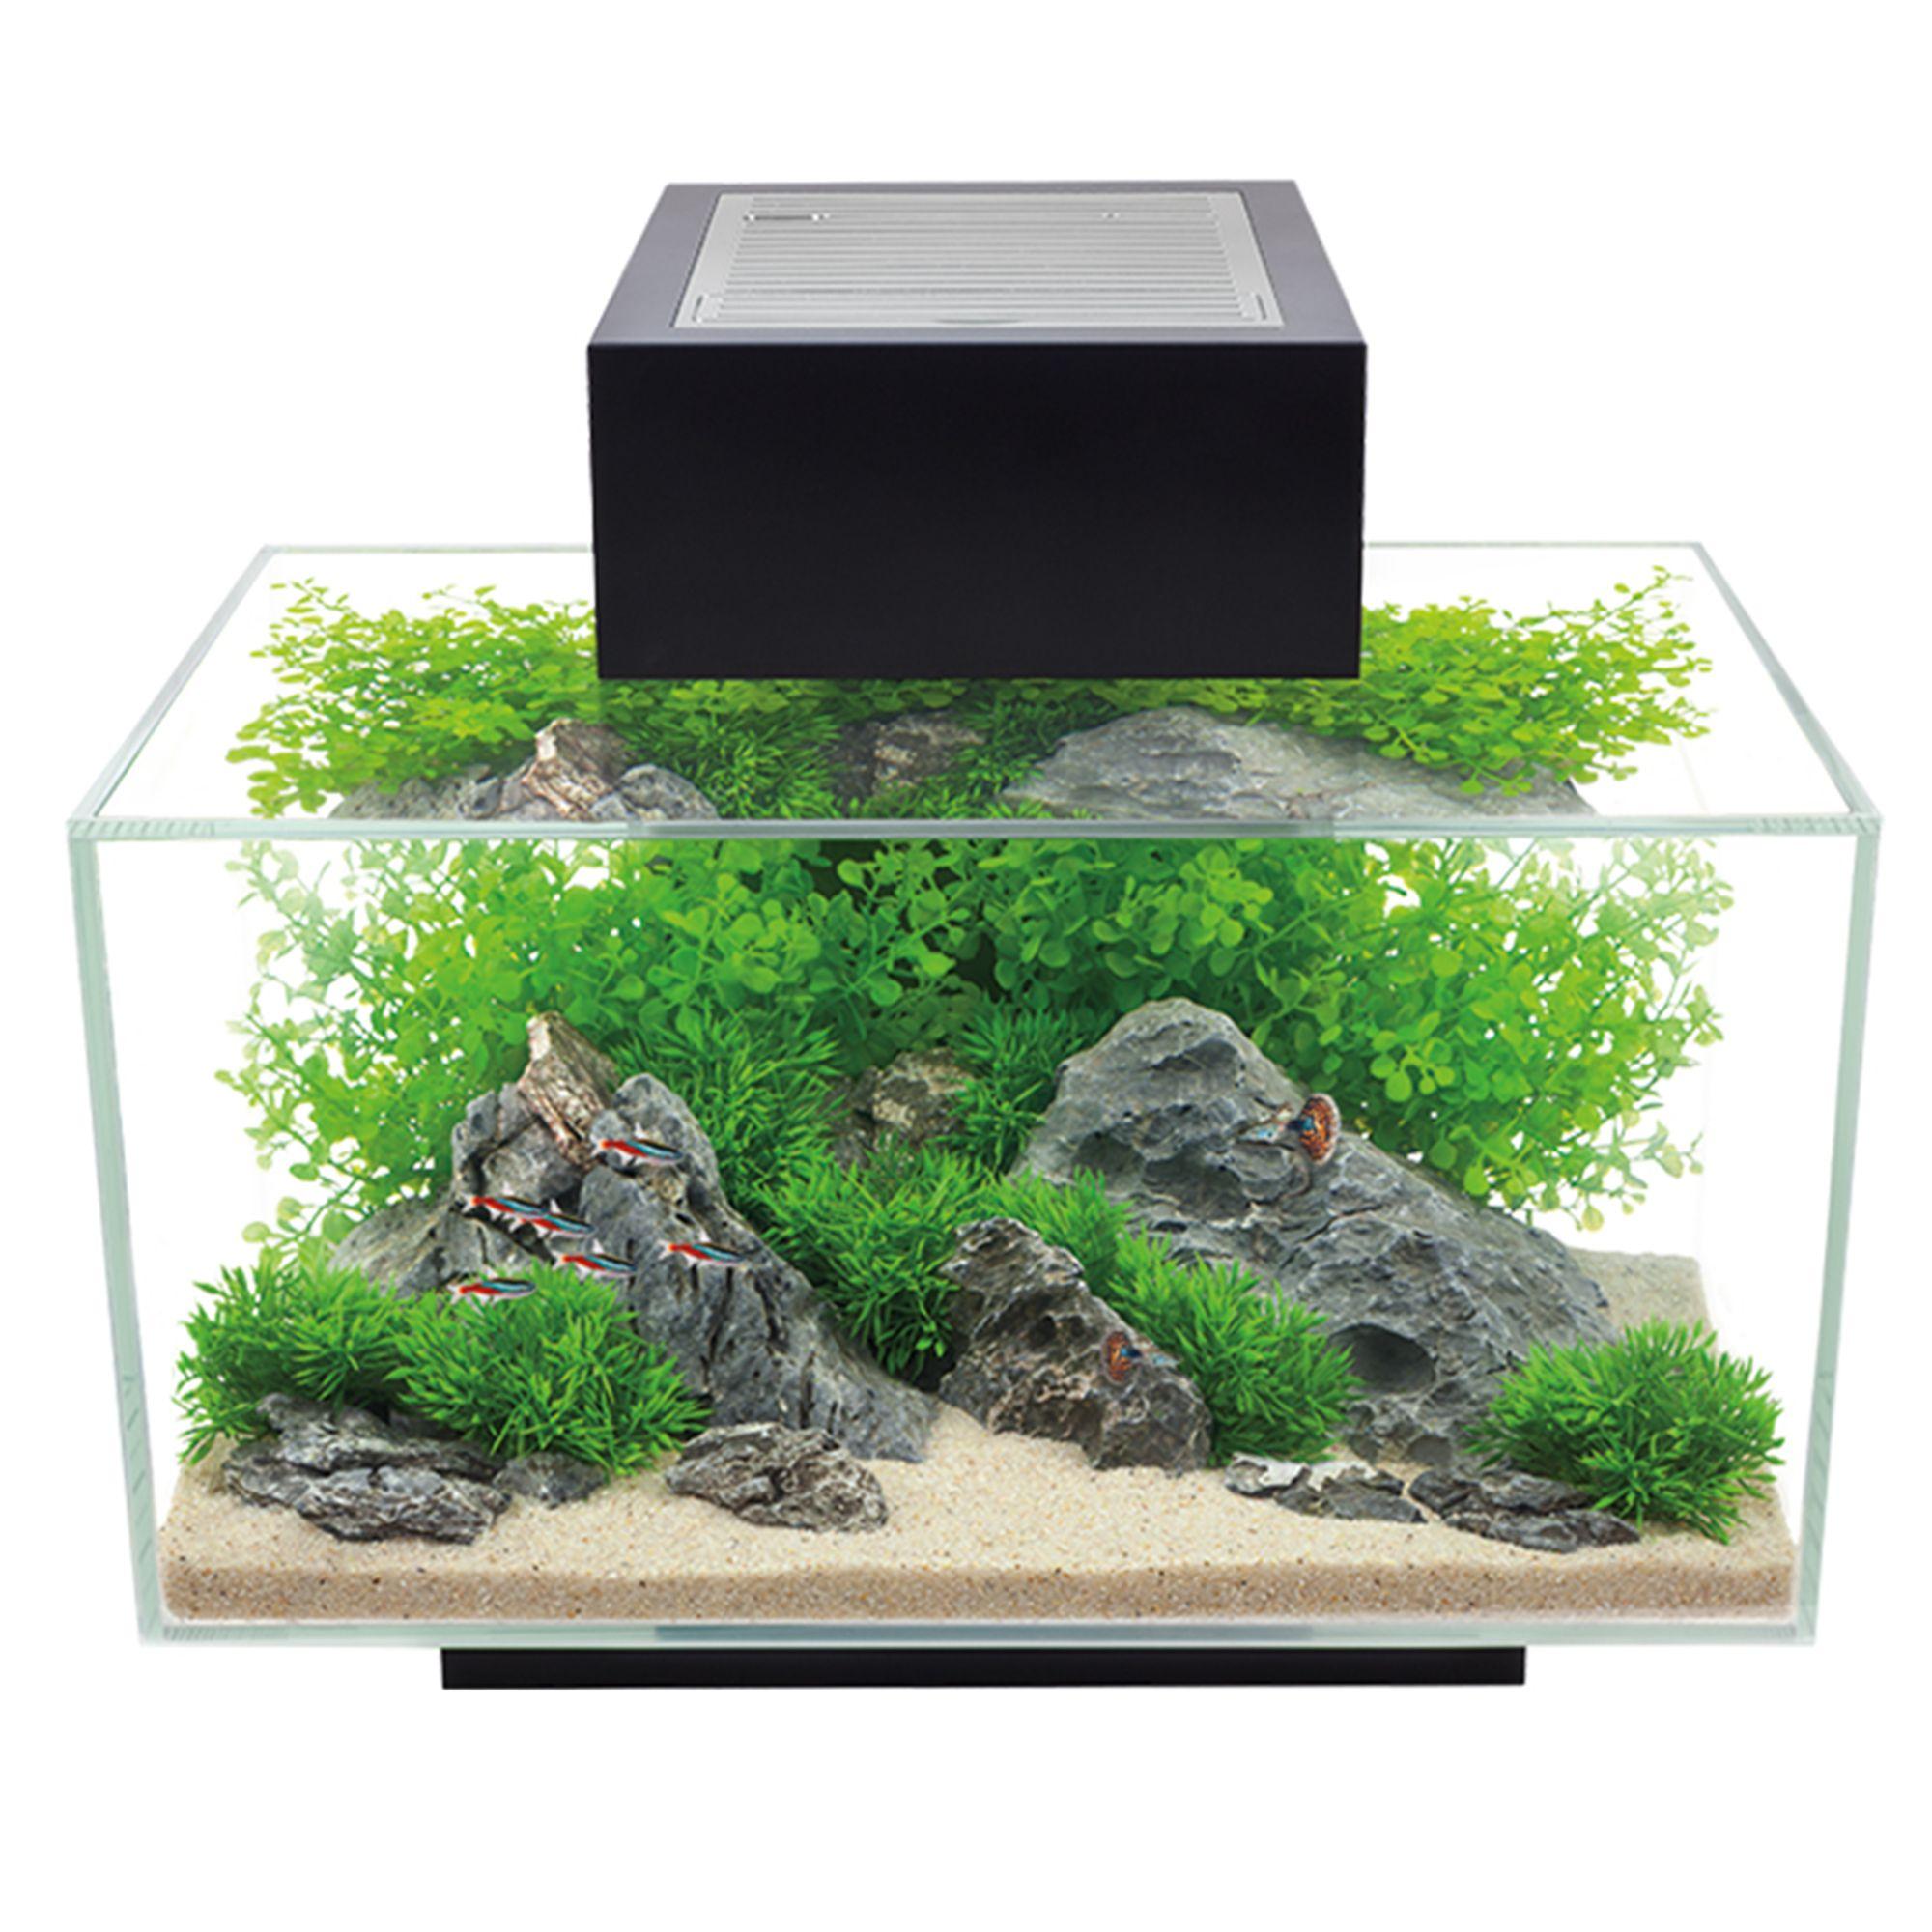 Fluval Edge Aquarium Kit 6 Gallon